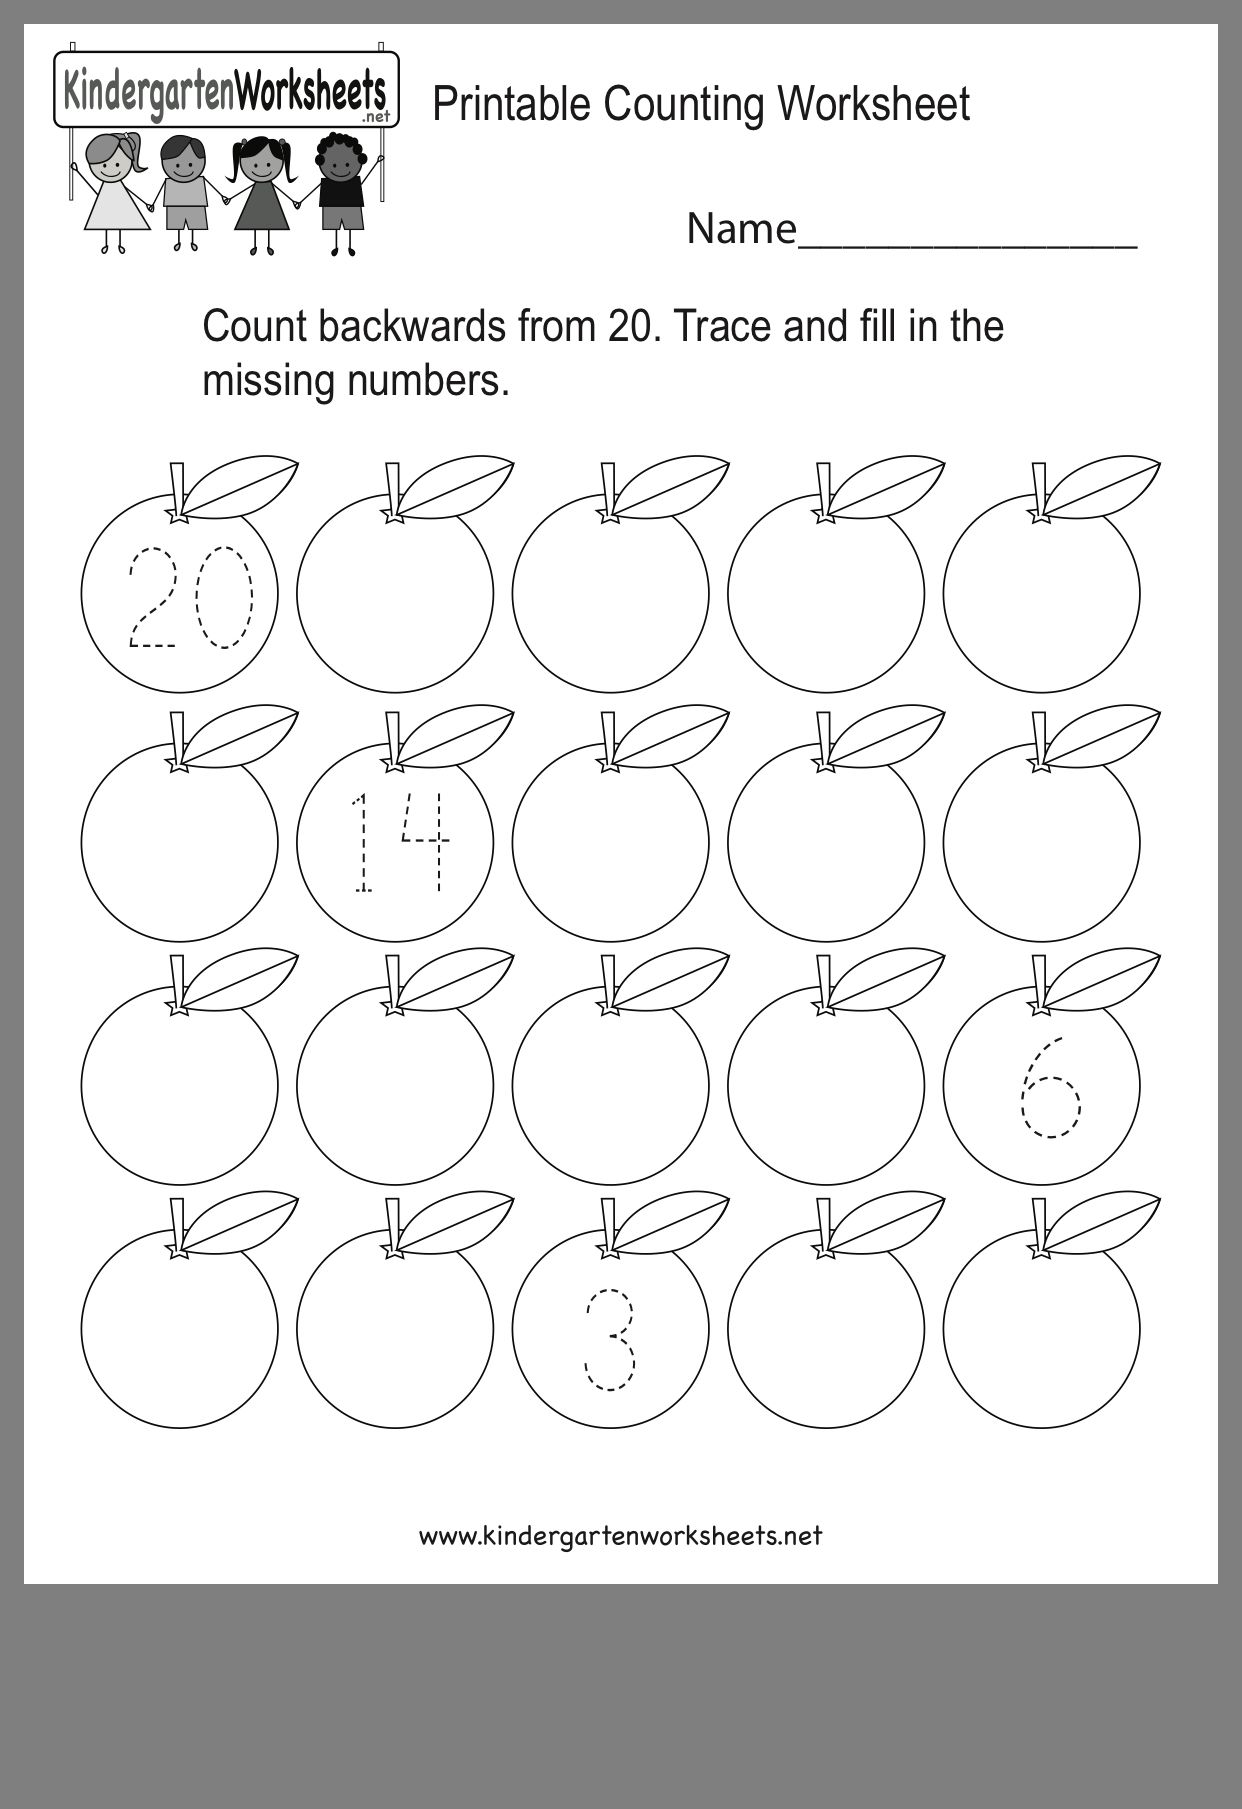 Pin By Gina Castellanos On Handmade Preschool Worksheets Counting Worksheets Printable Worksheets [ 1809 x 1242 Pixel ]